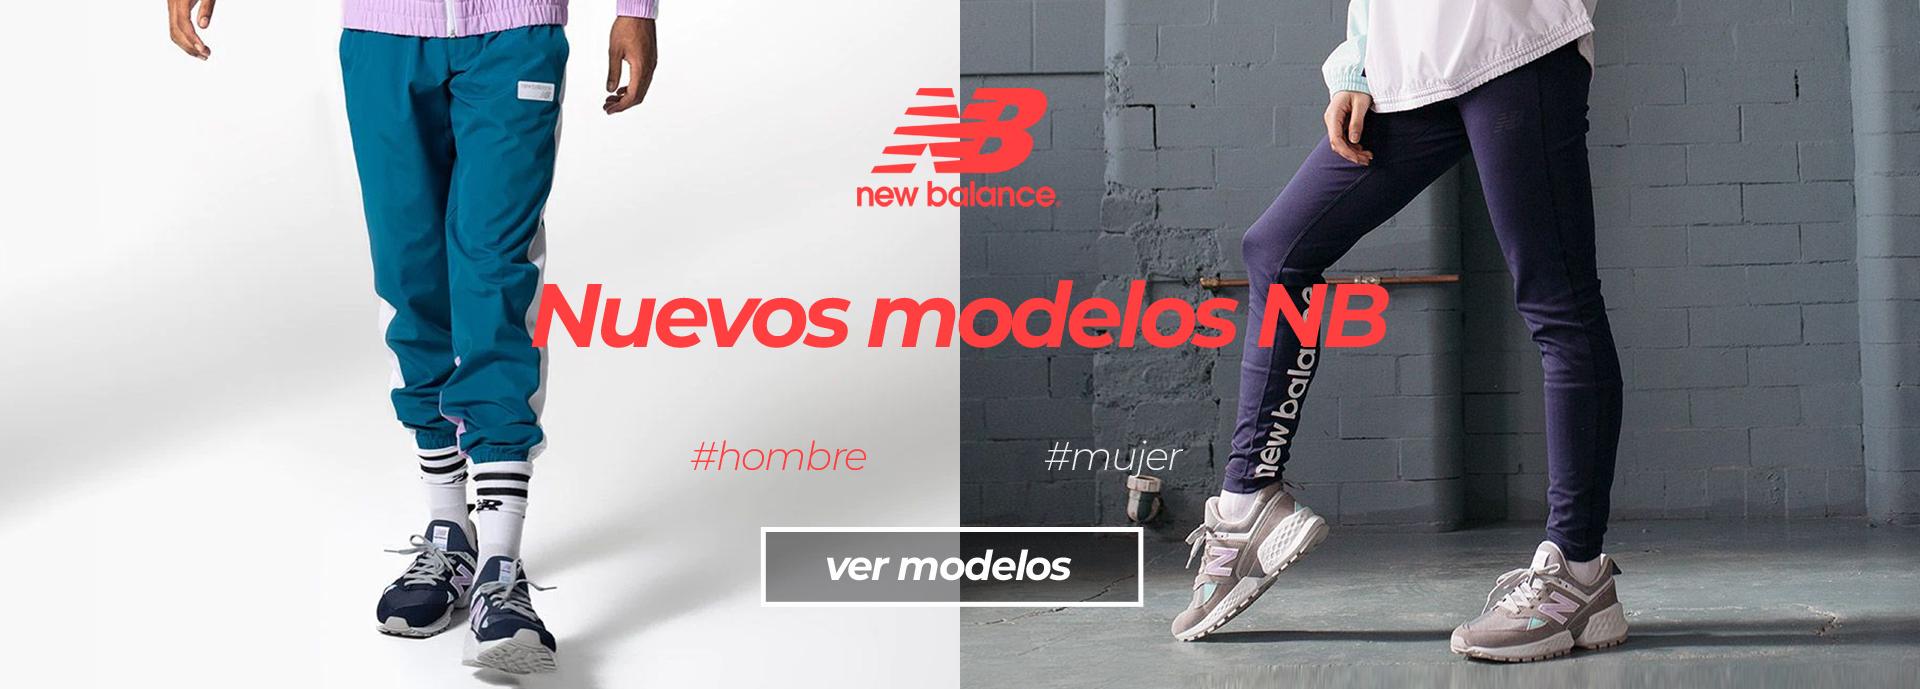 new balance 009 hombre